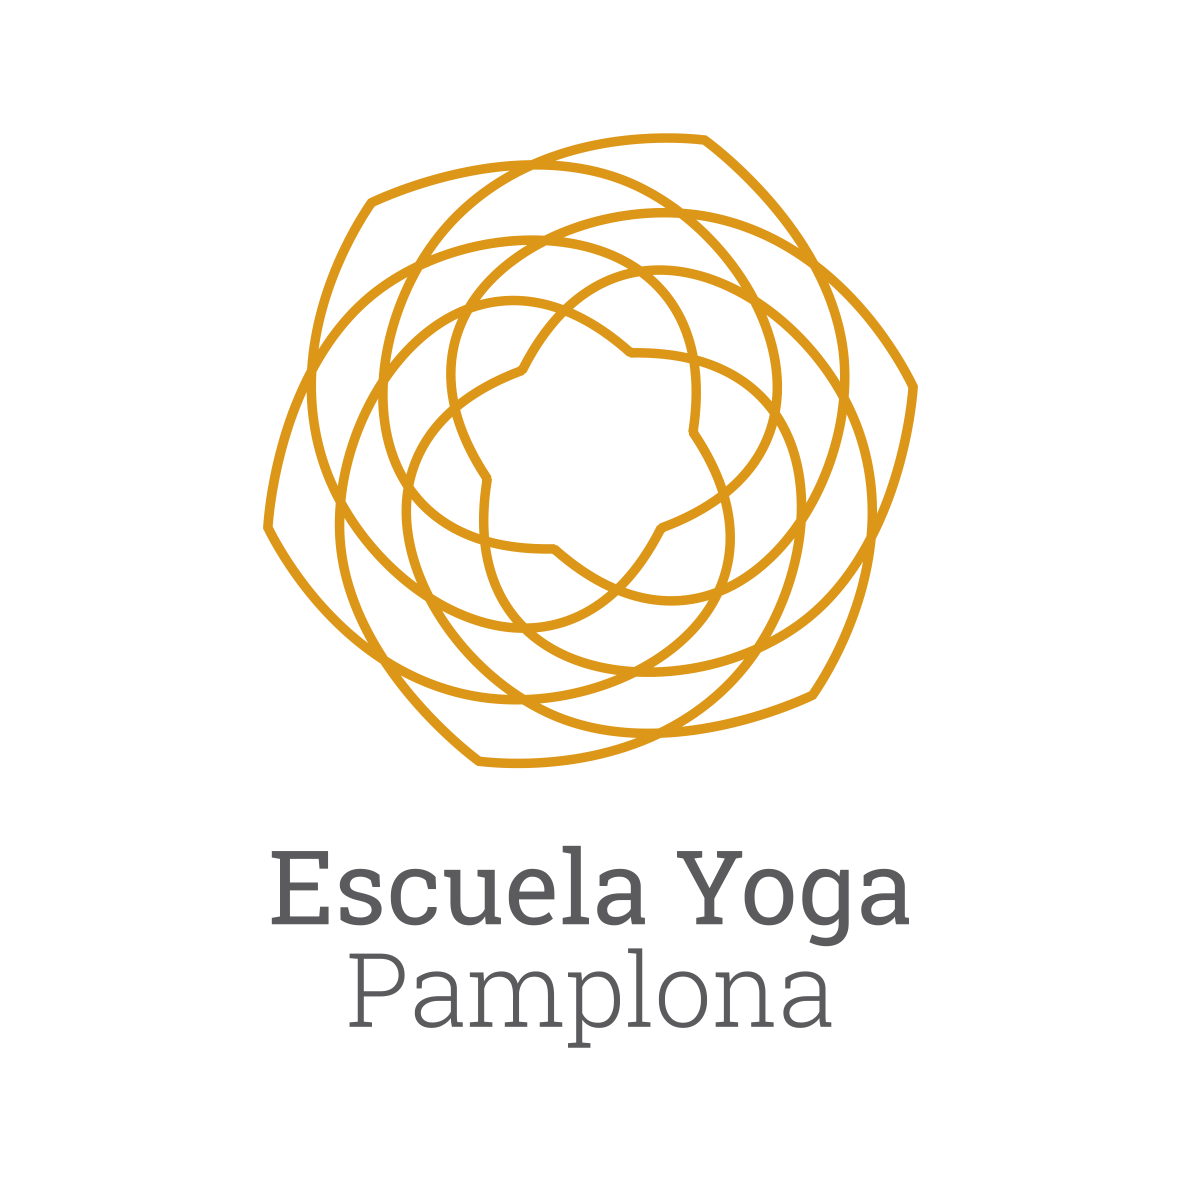 Escuela Yoga Pamplona